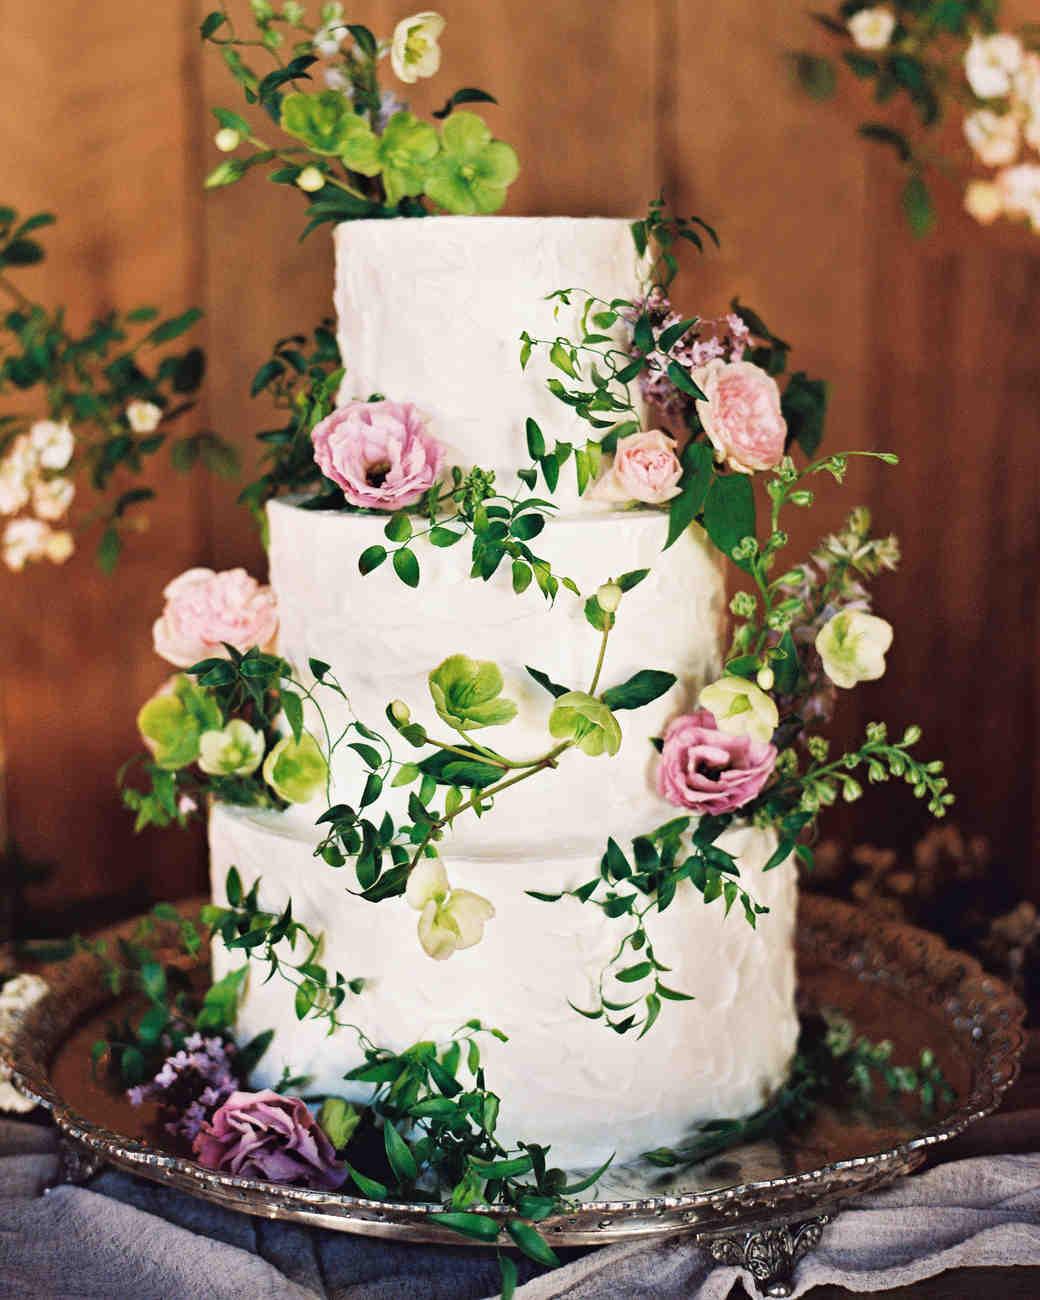 Wedding Cakes Flowers  44 Wedding Cakes with Fresh Flowers